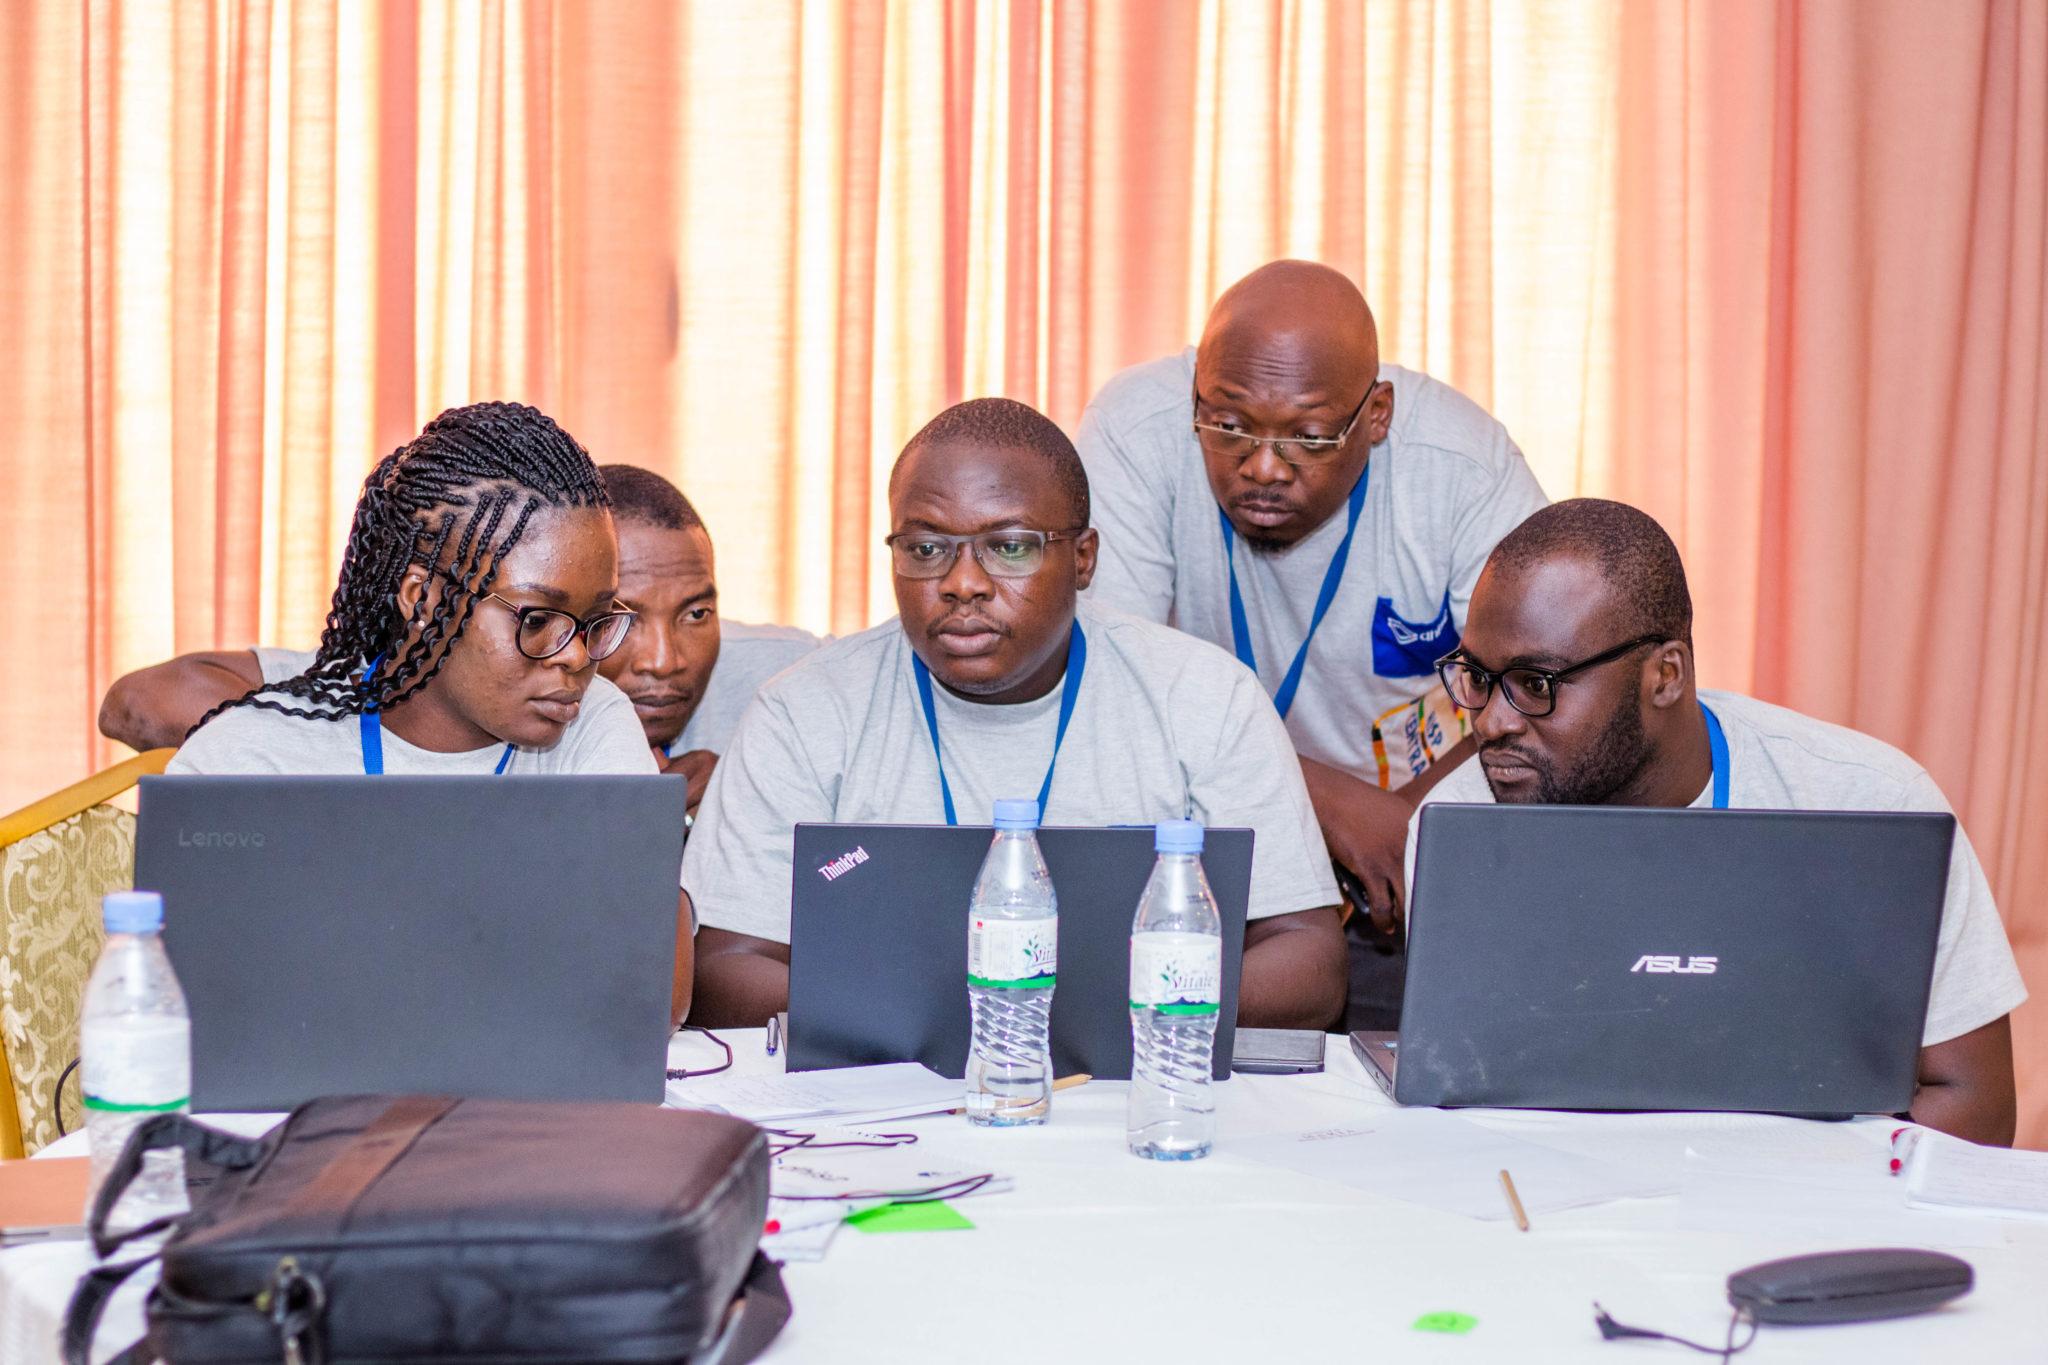 Togo Academy group work